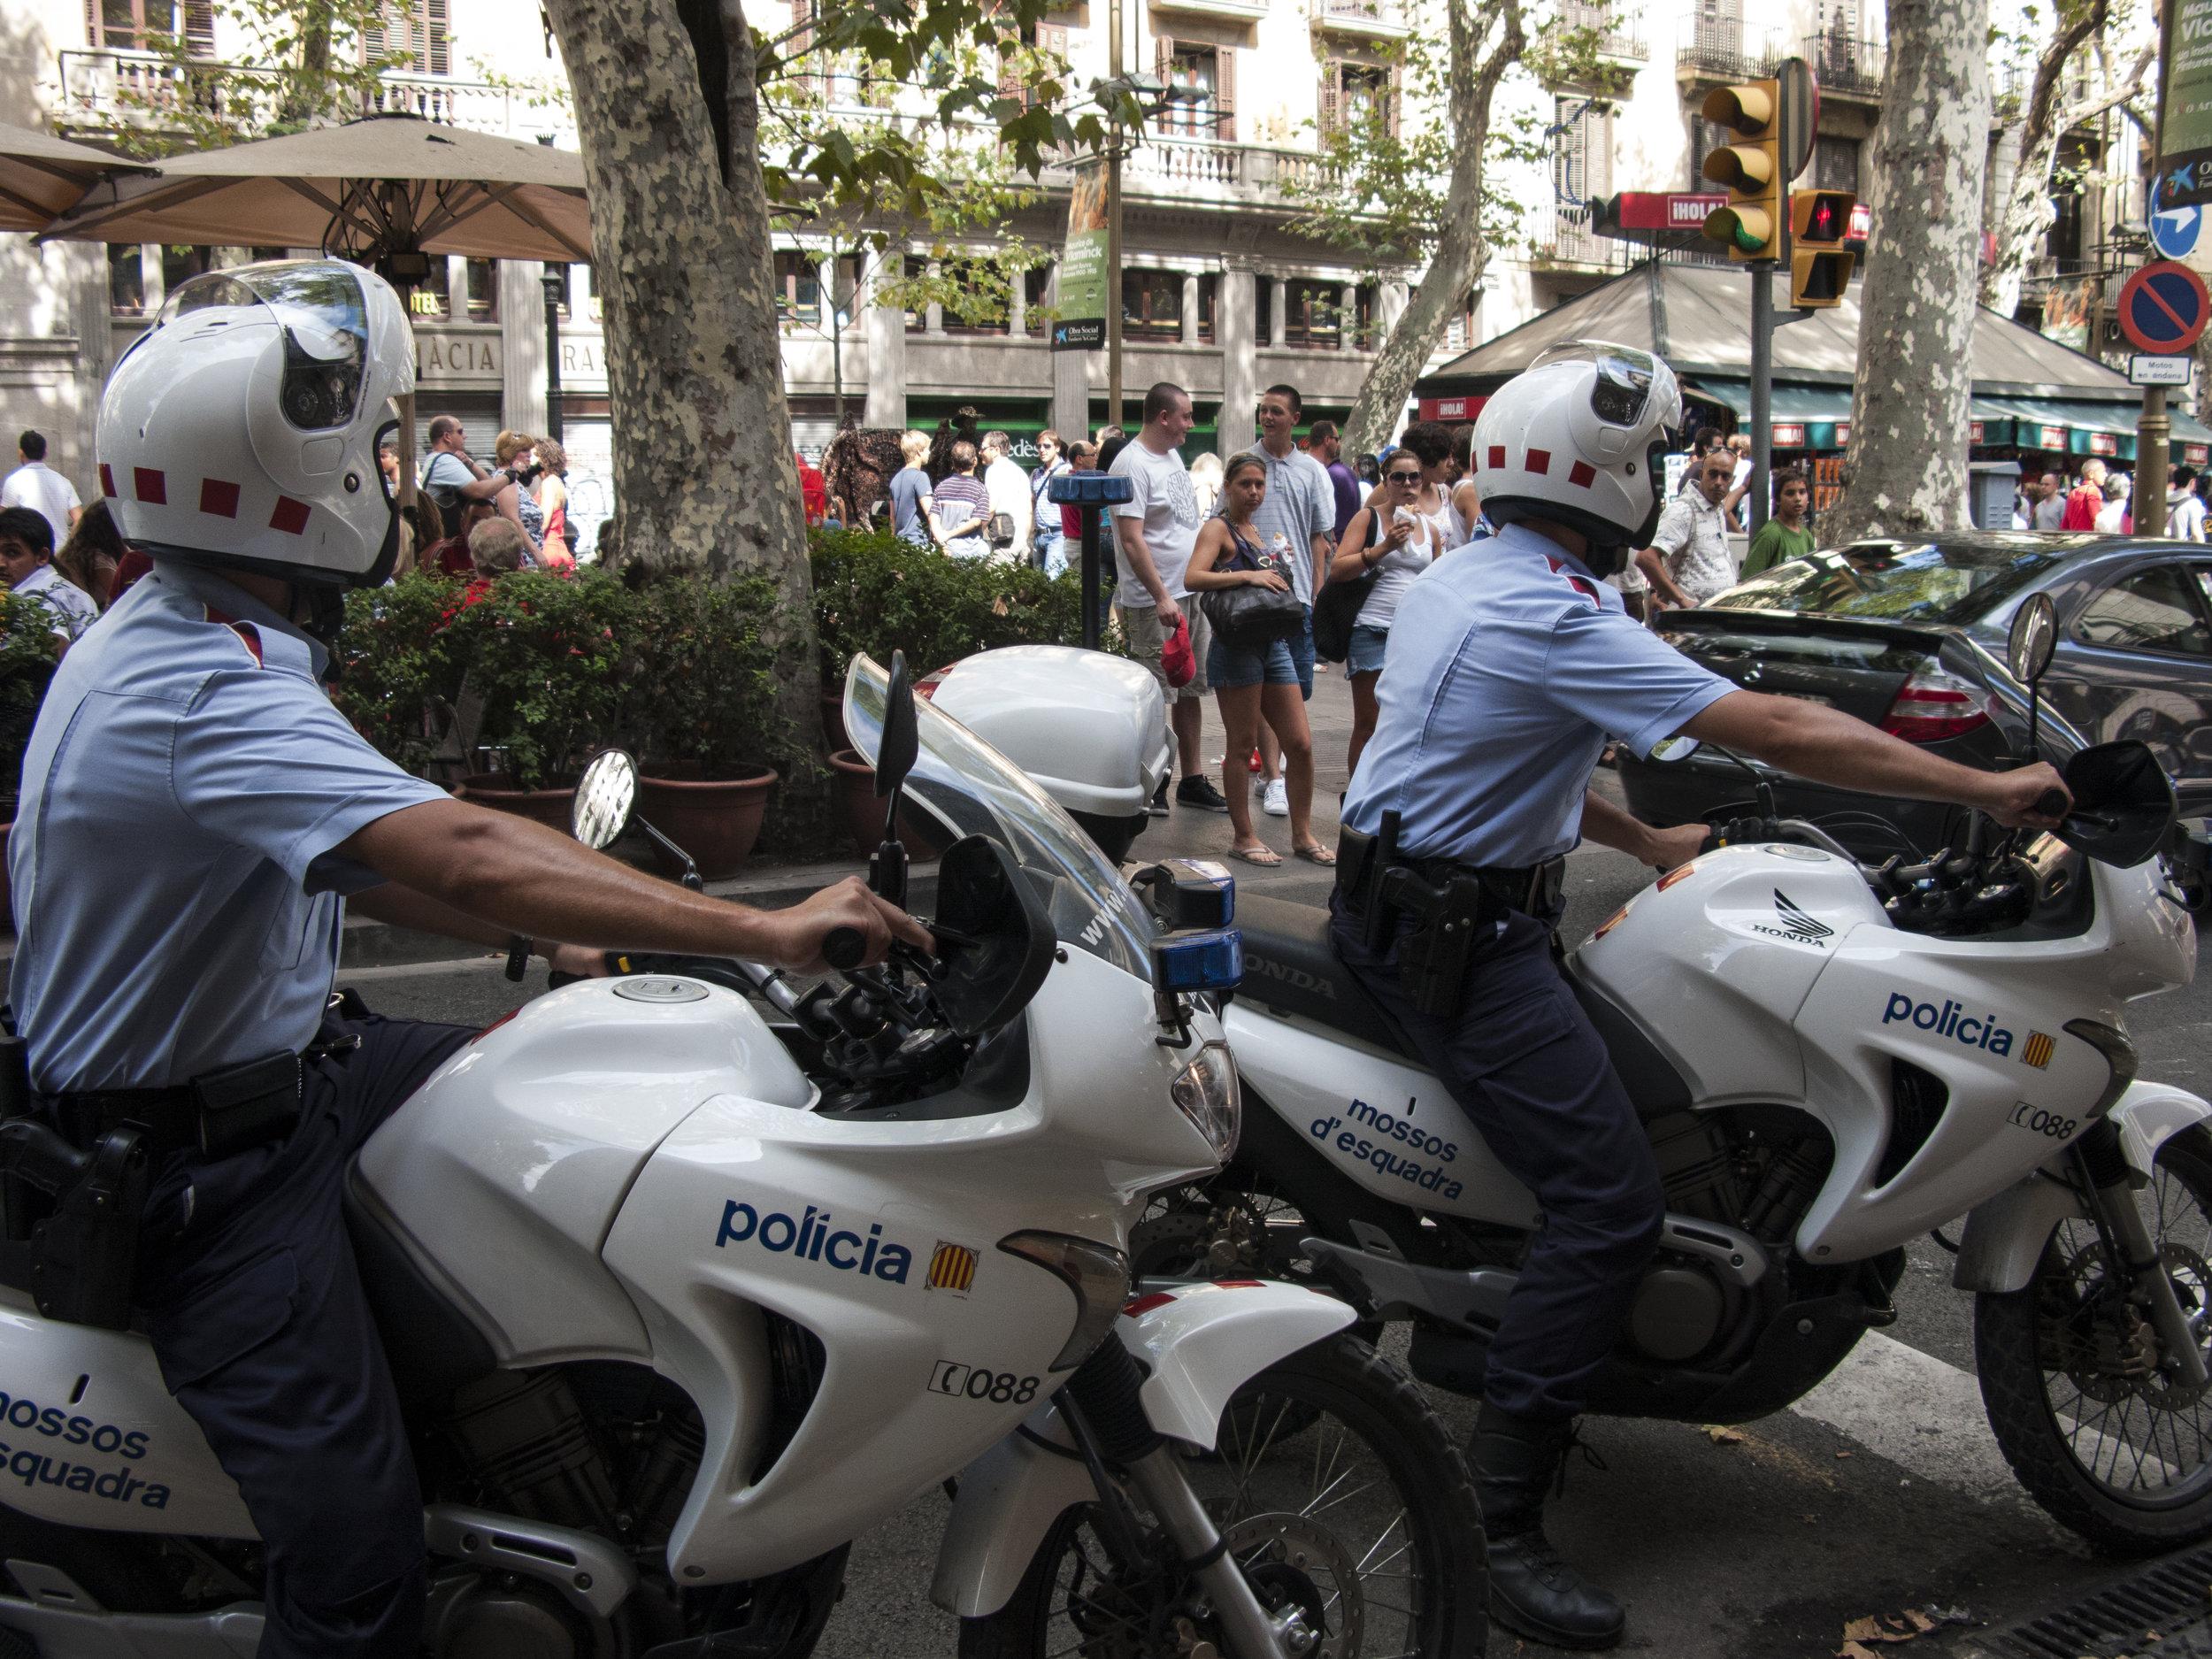 Ramblas Patrol